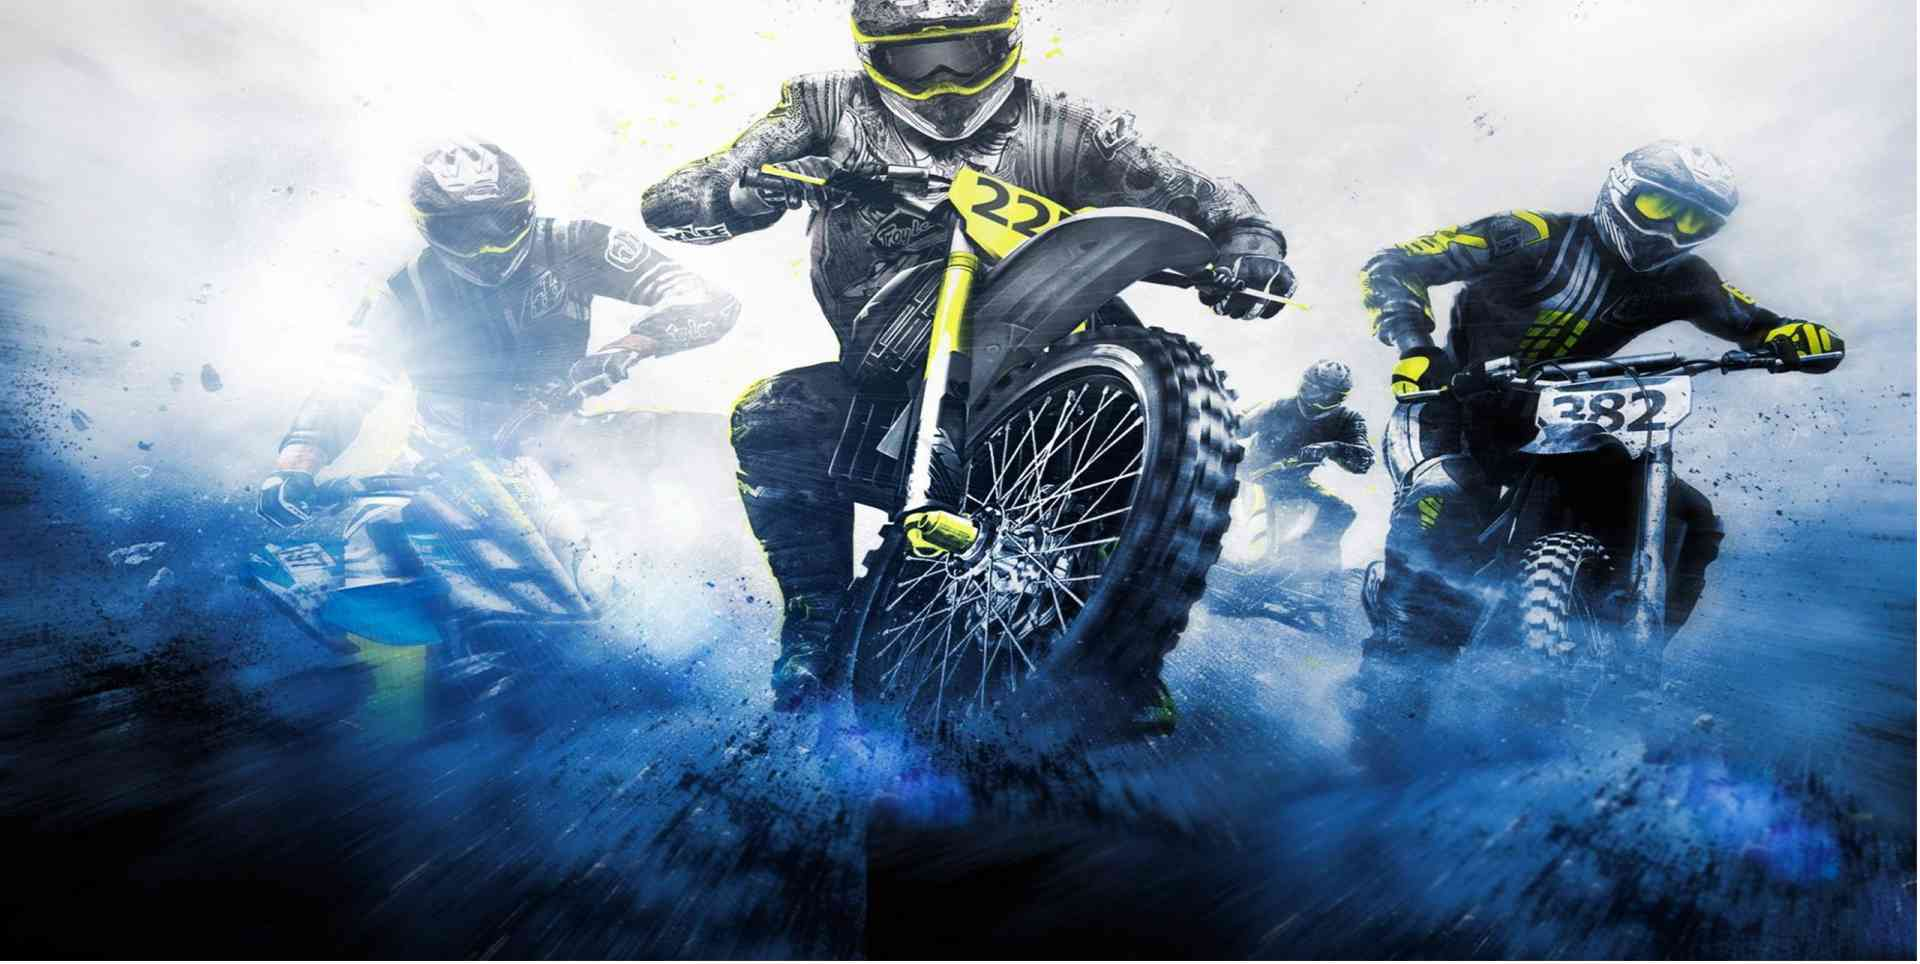 Watch RedBud National Motocross Live